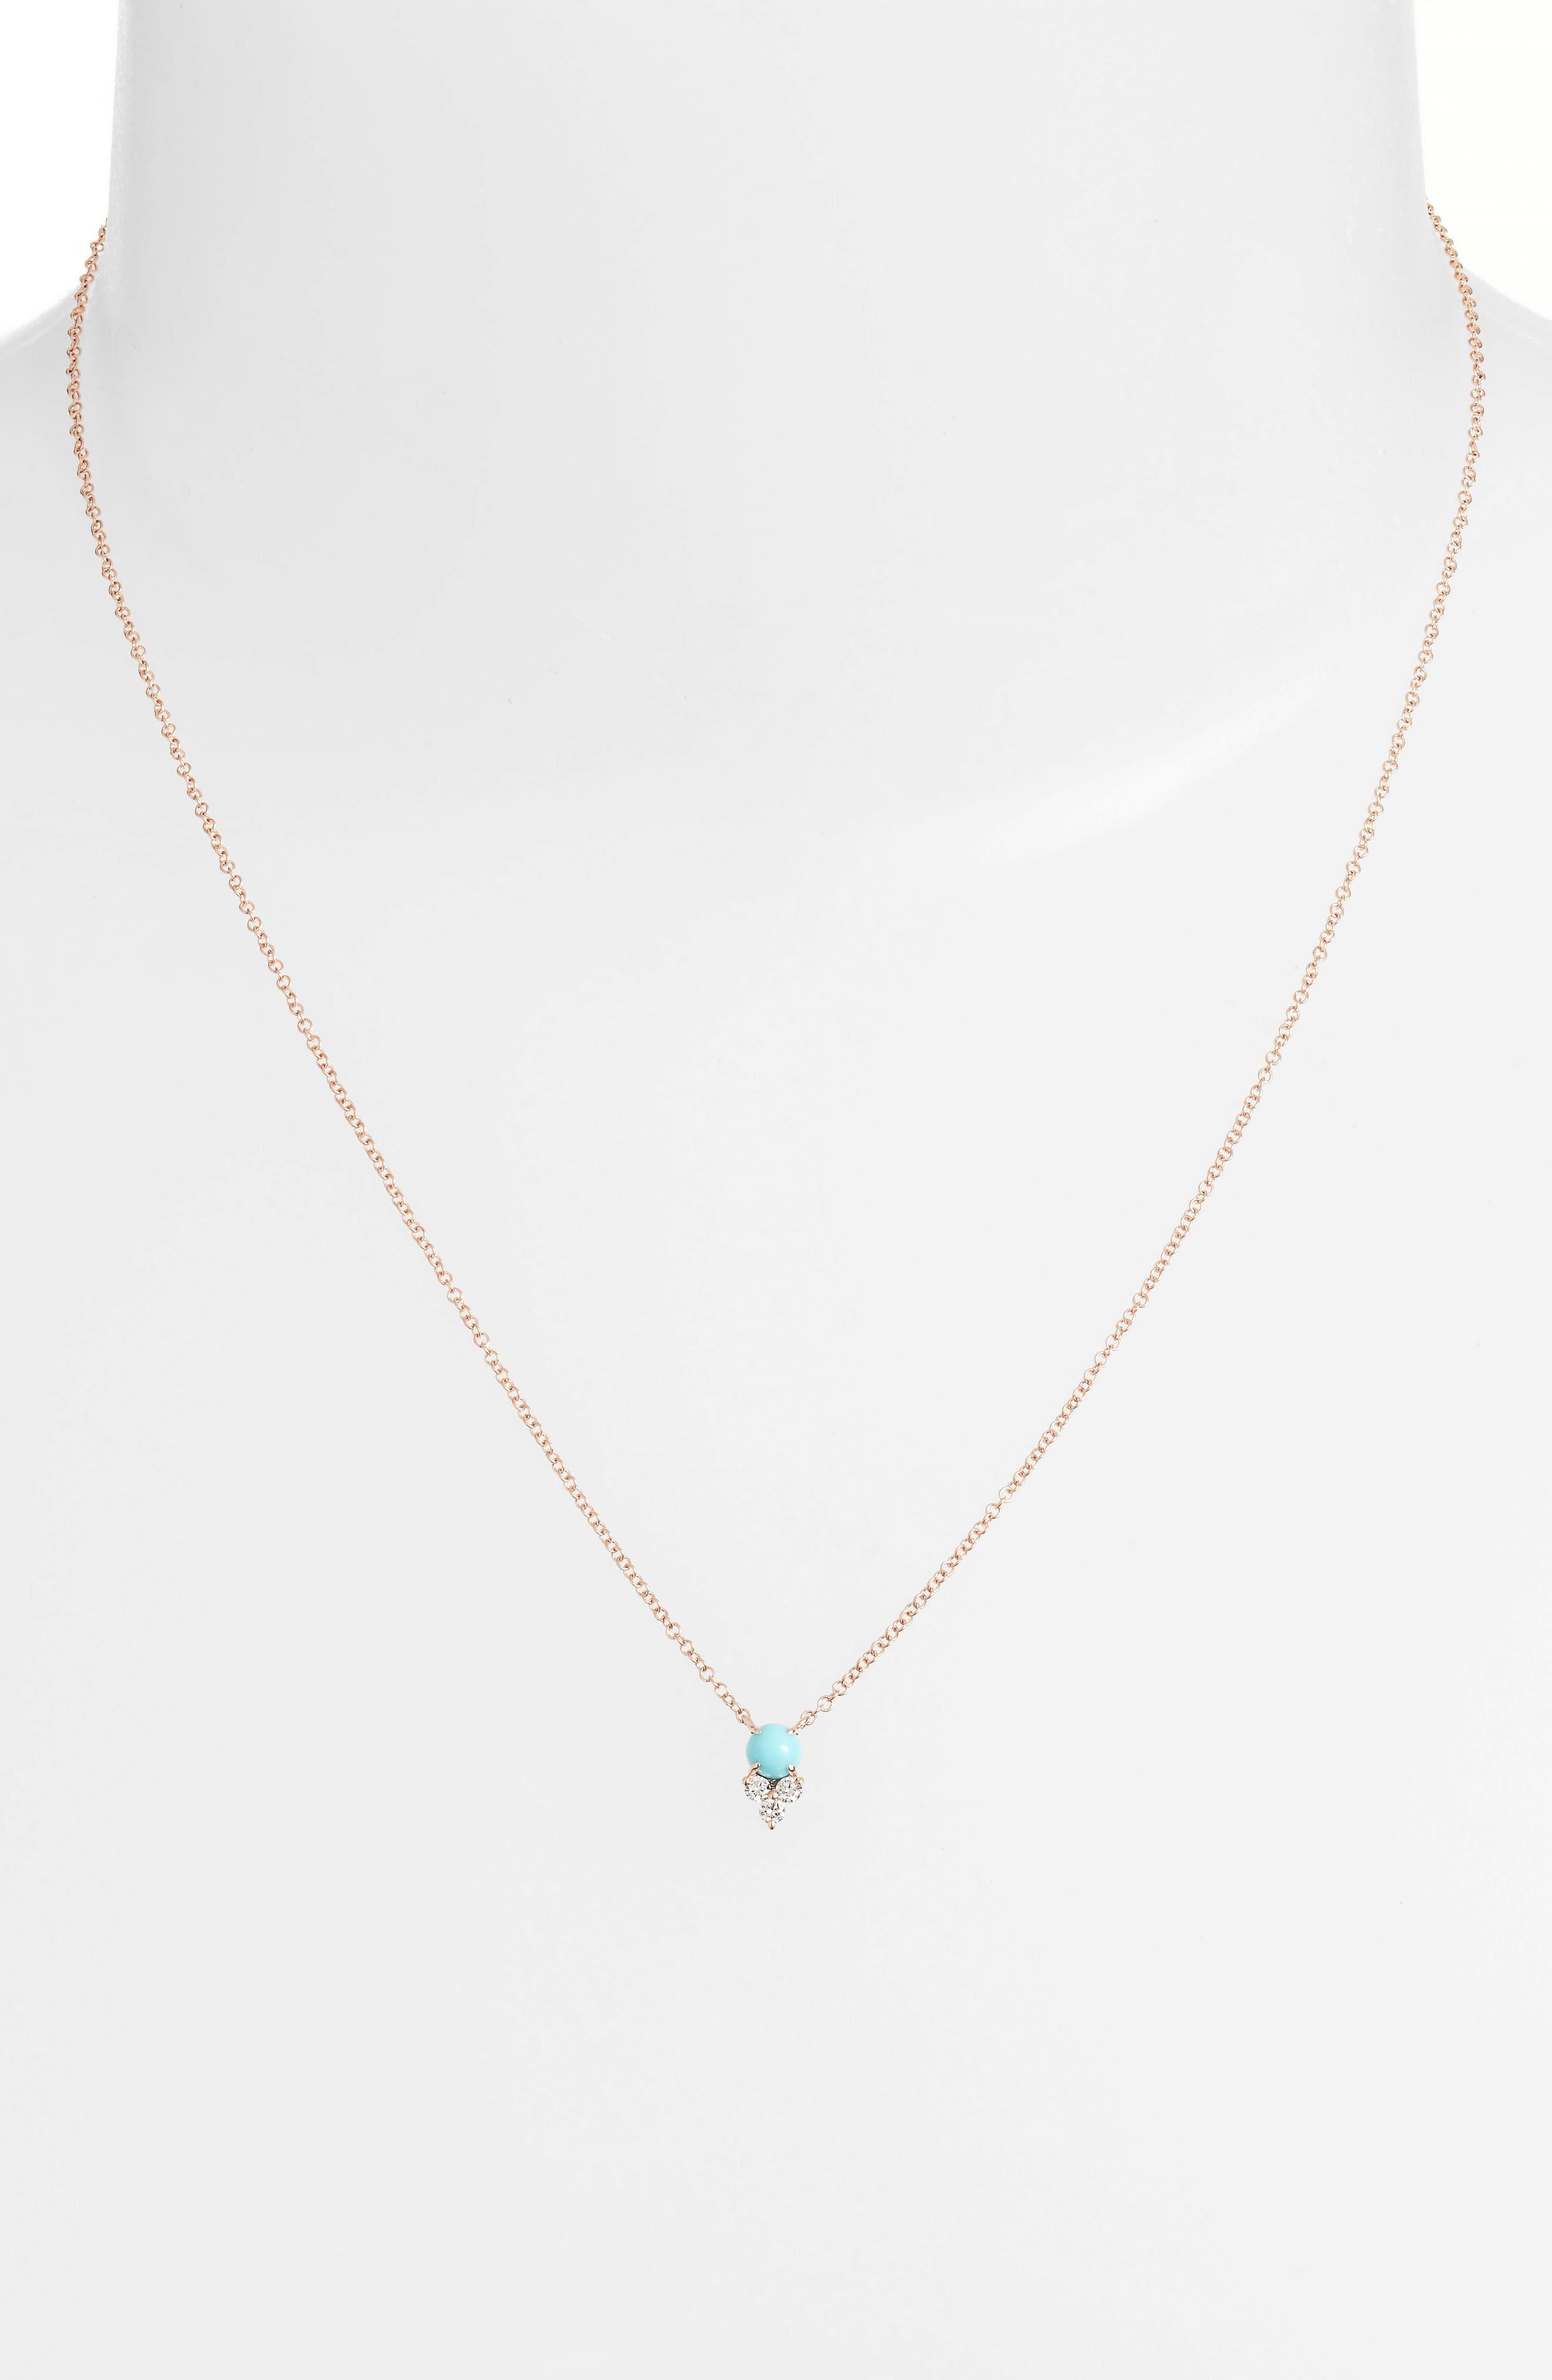 Diamond Trio Stone Pendant Necklace,                             Alternate thumbnail 2, color,                             Rose Gold/ Turquoise